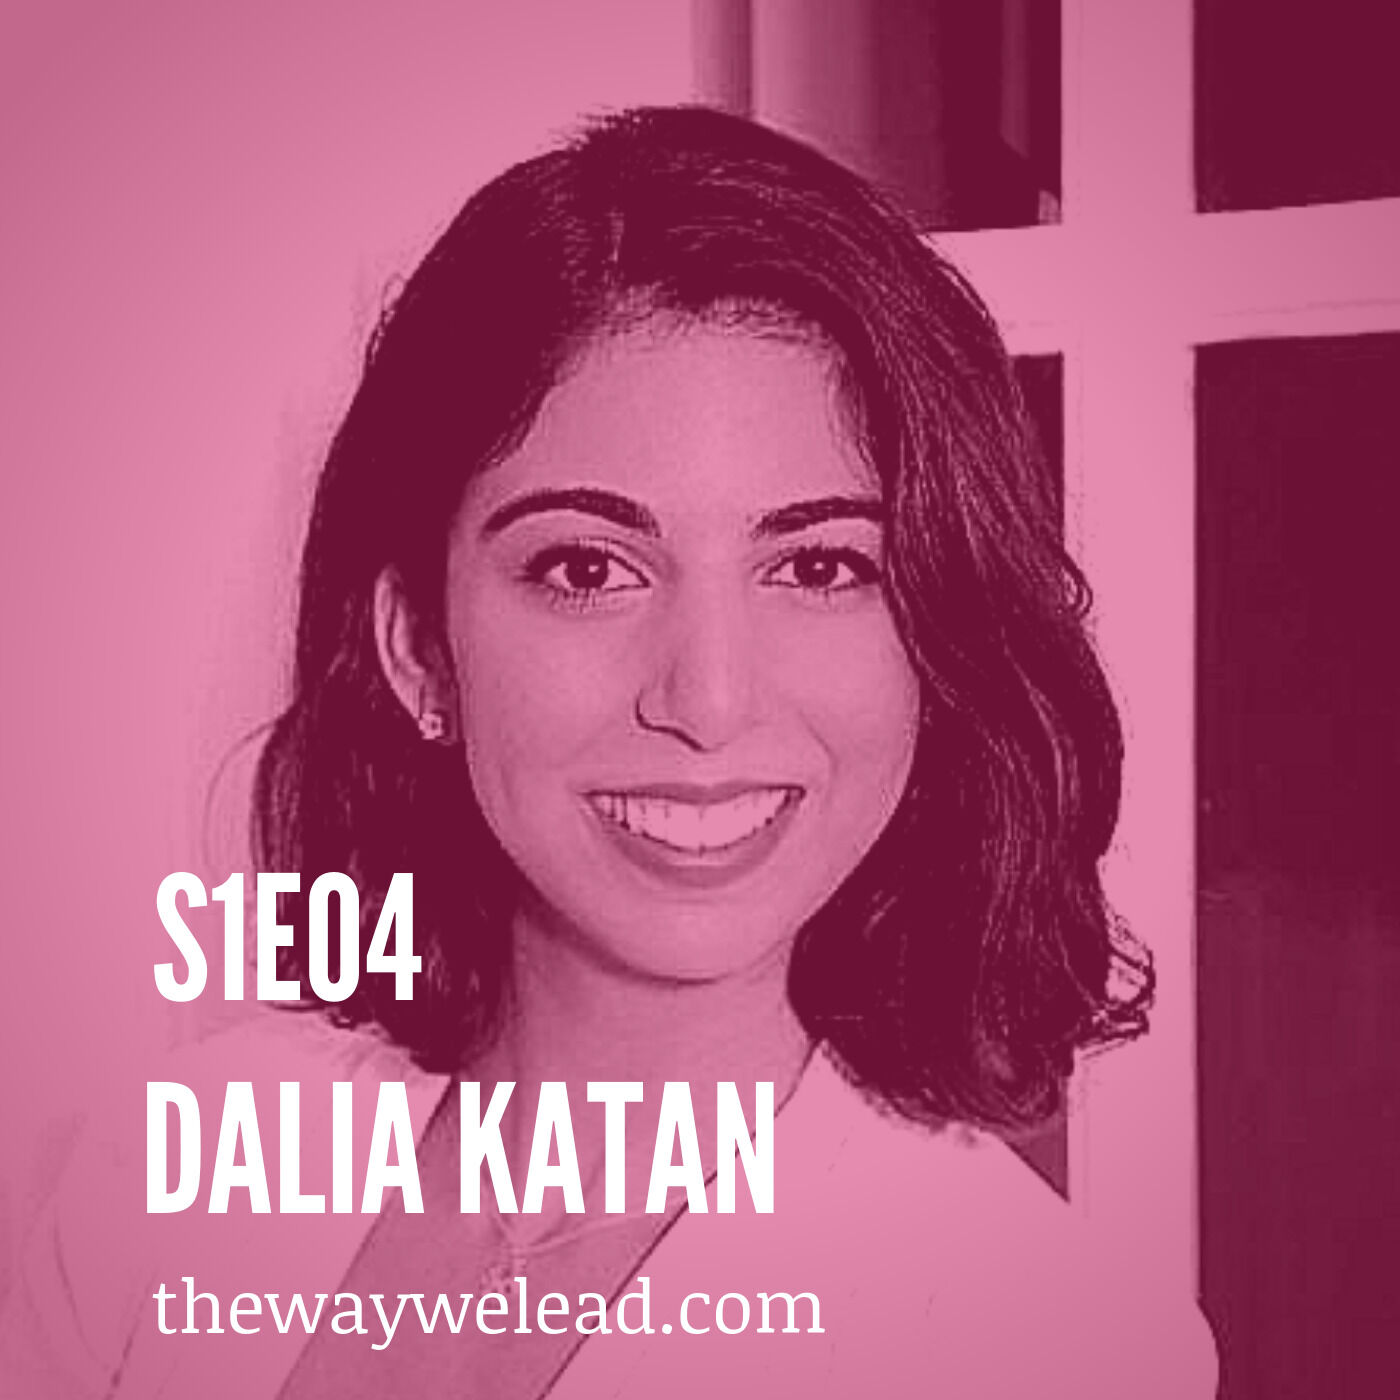 S1E4: How to Create More Inclusive Workplaces With Dalia Katan